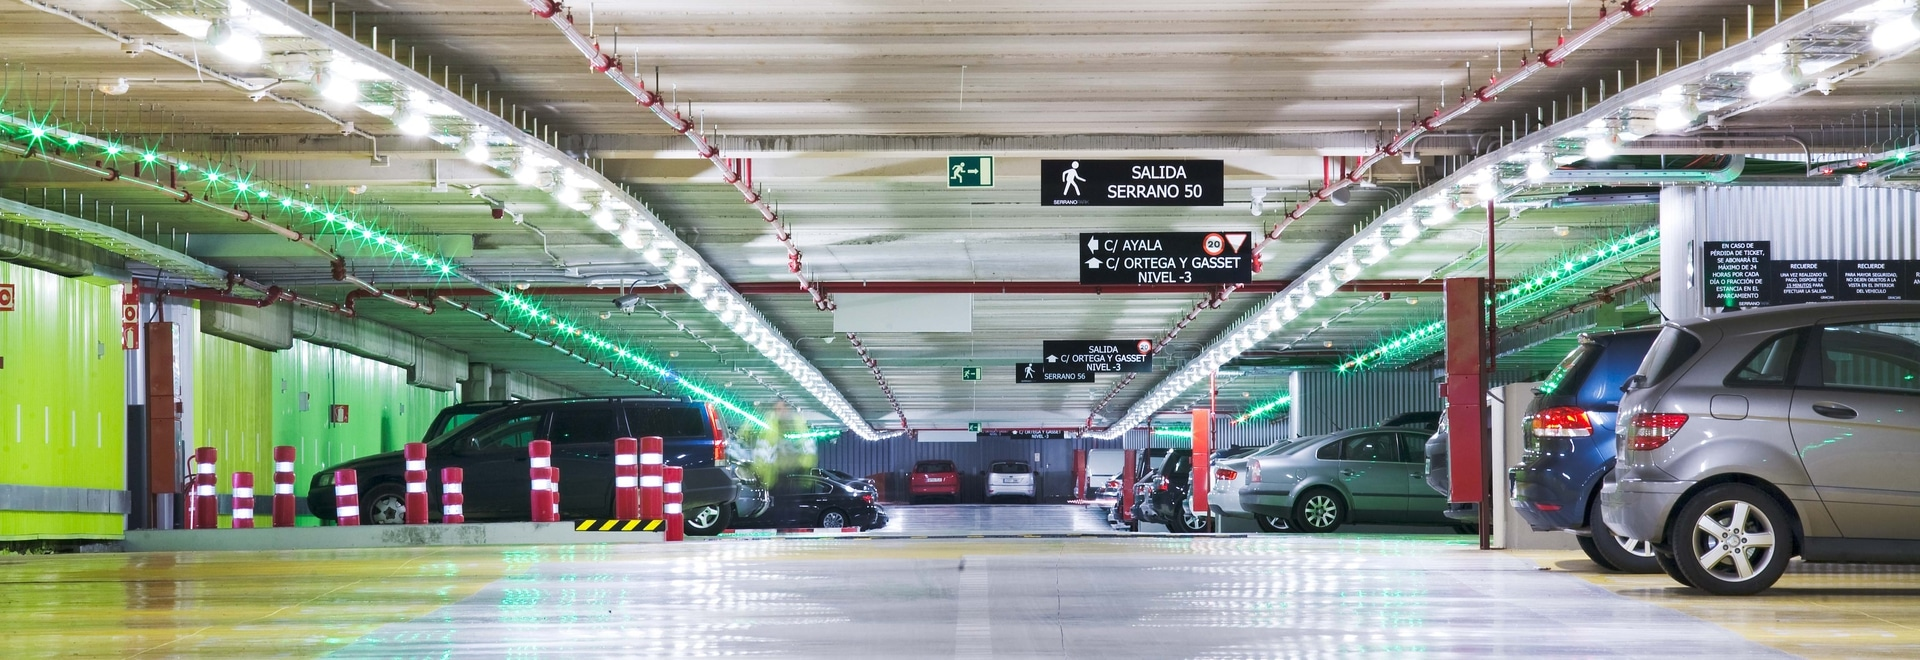 Serrano Car Park